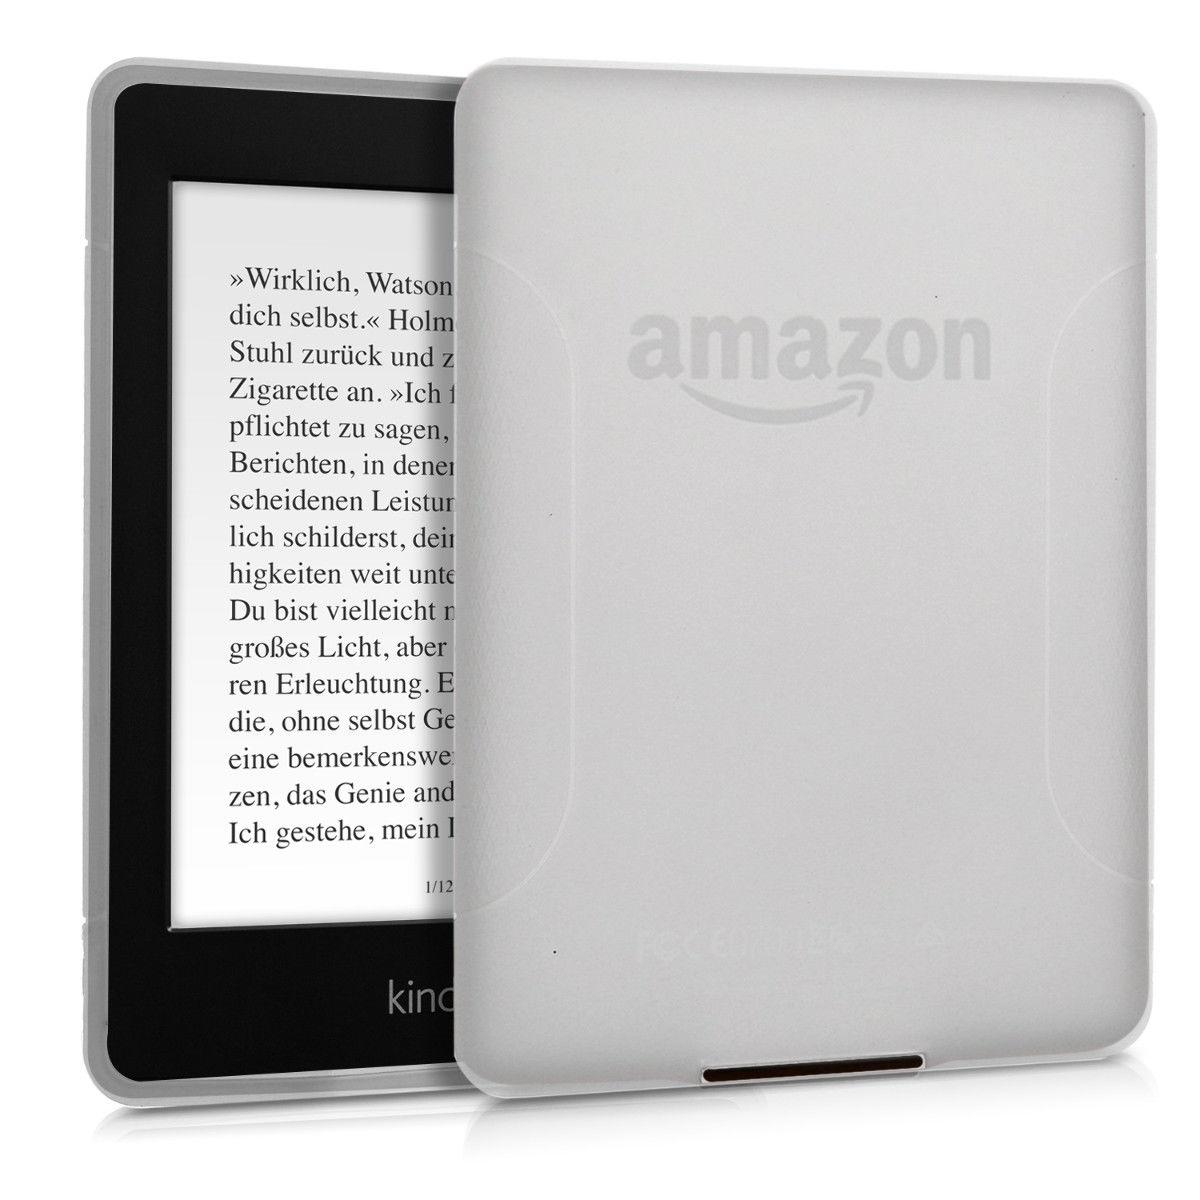 Pouzdro GEL pro Amazon Kindle Paperwhite